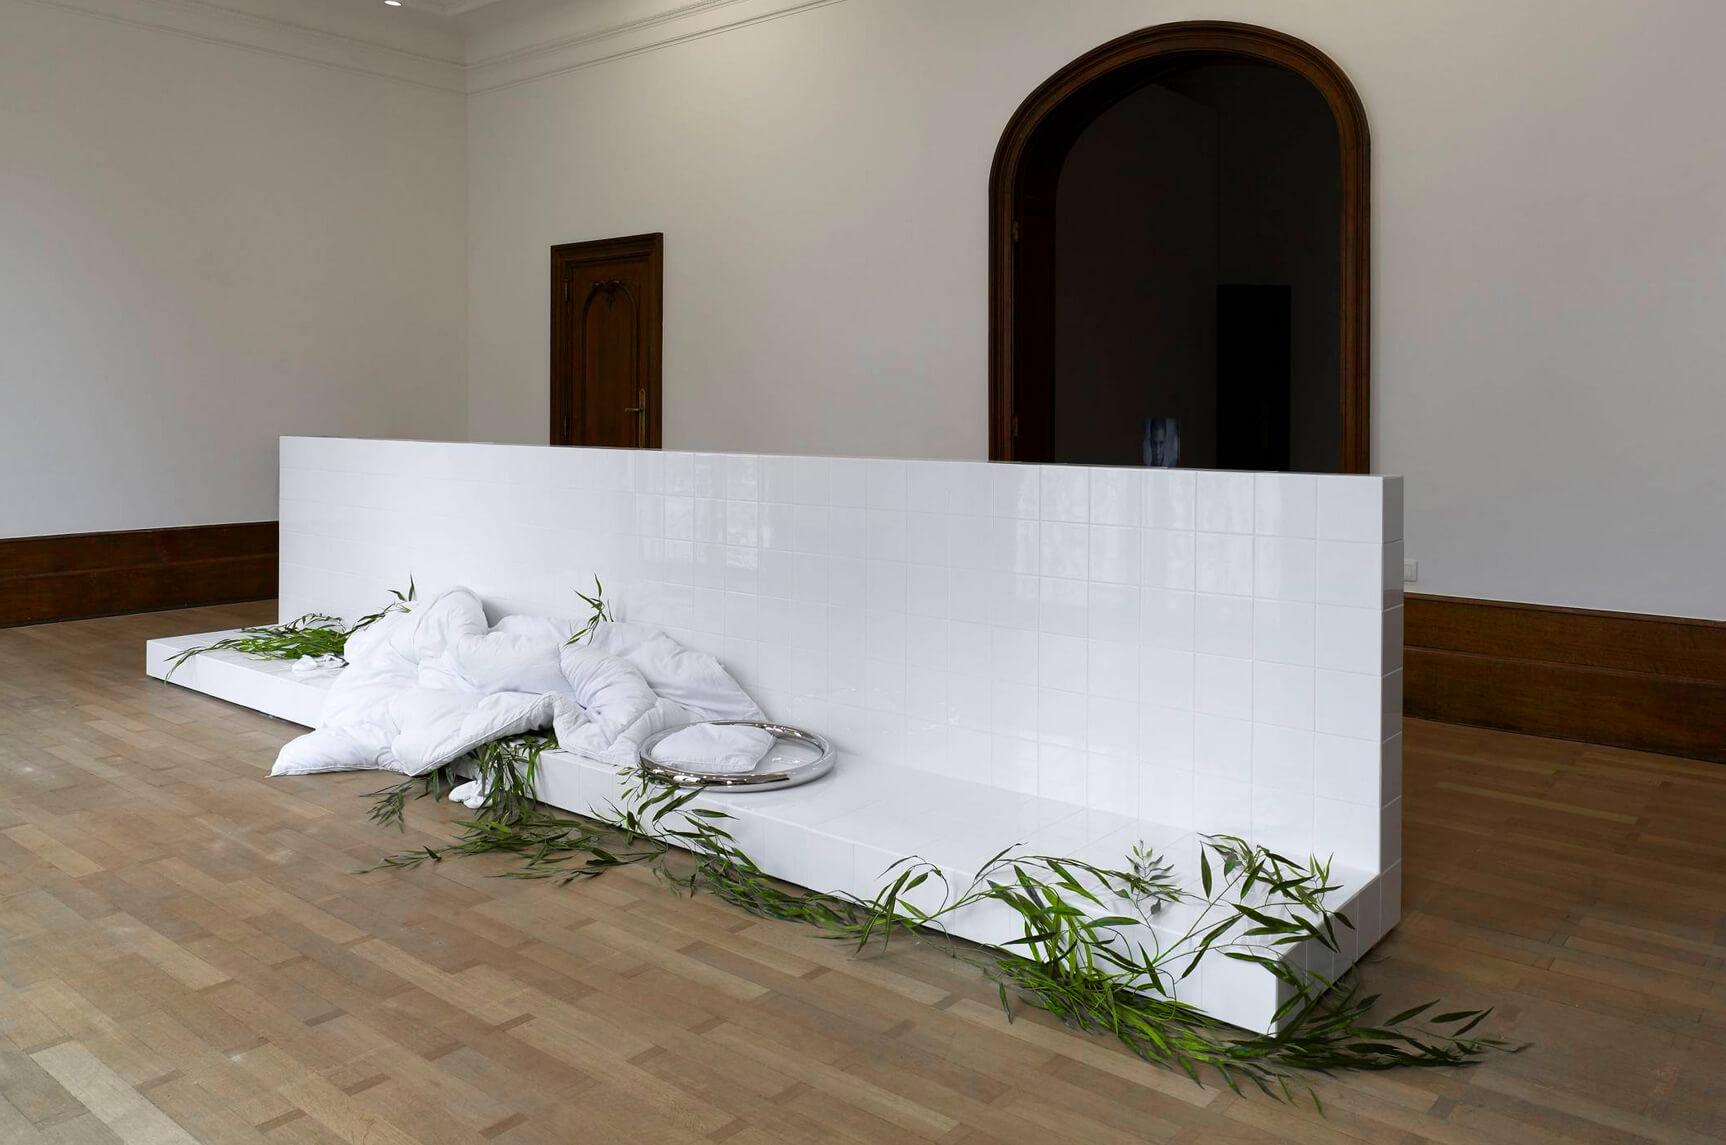 PremSahib-carrelage-tiles-art-fineart-exhibition-gallery-MendesWood-Brussels-OKTO-_01_PP